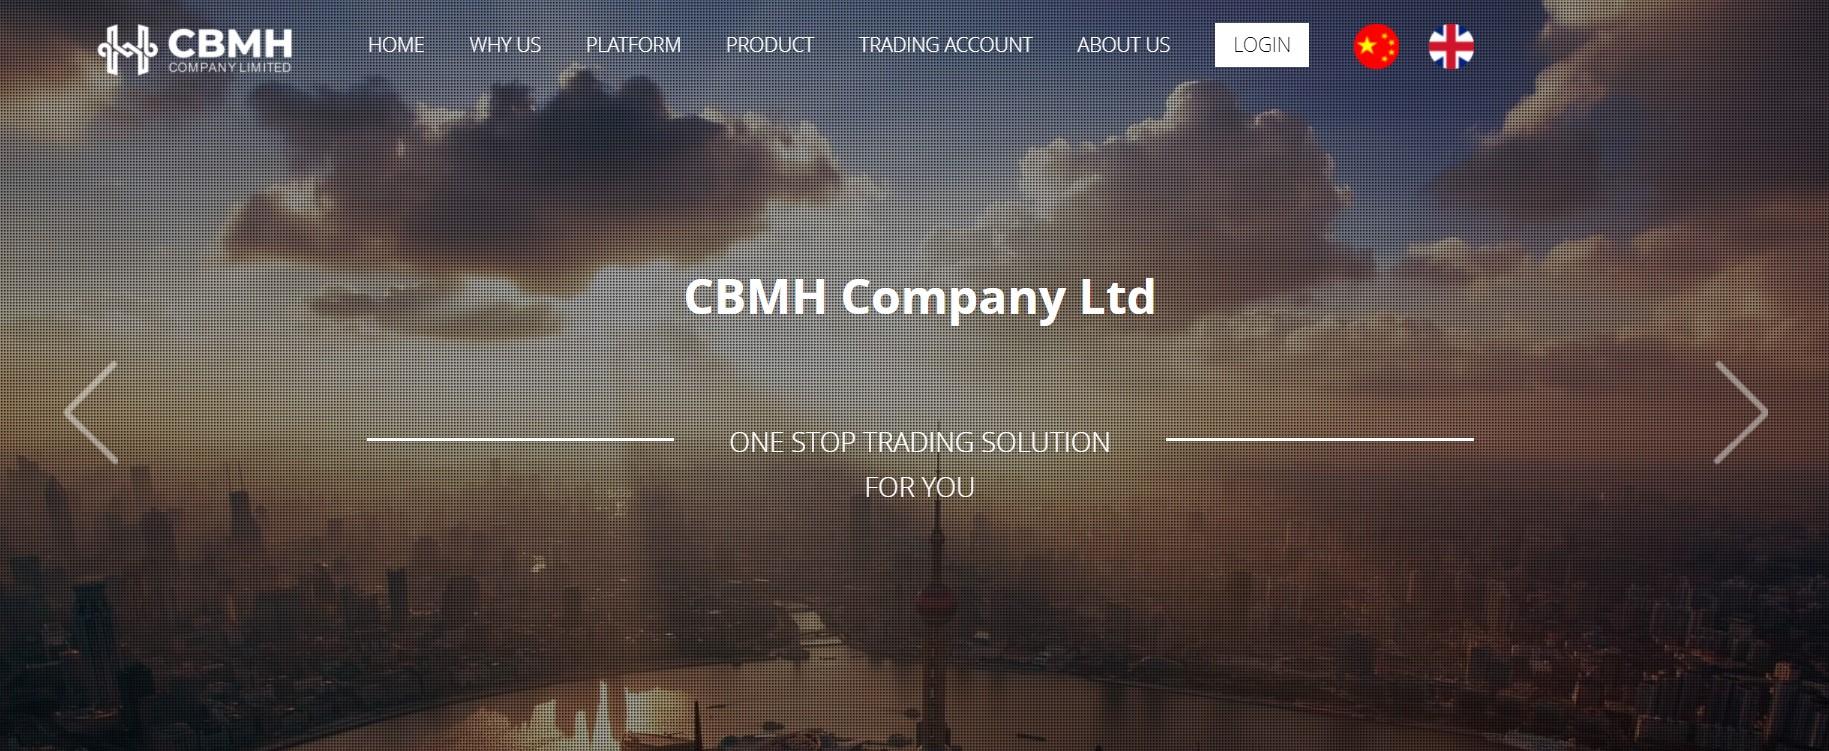 CBMH Market website